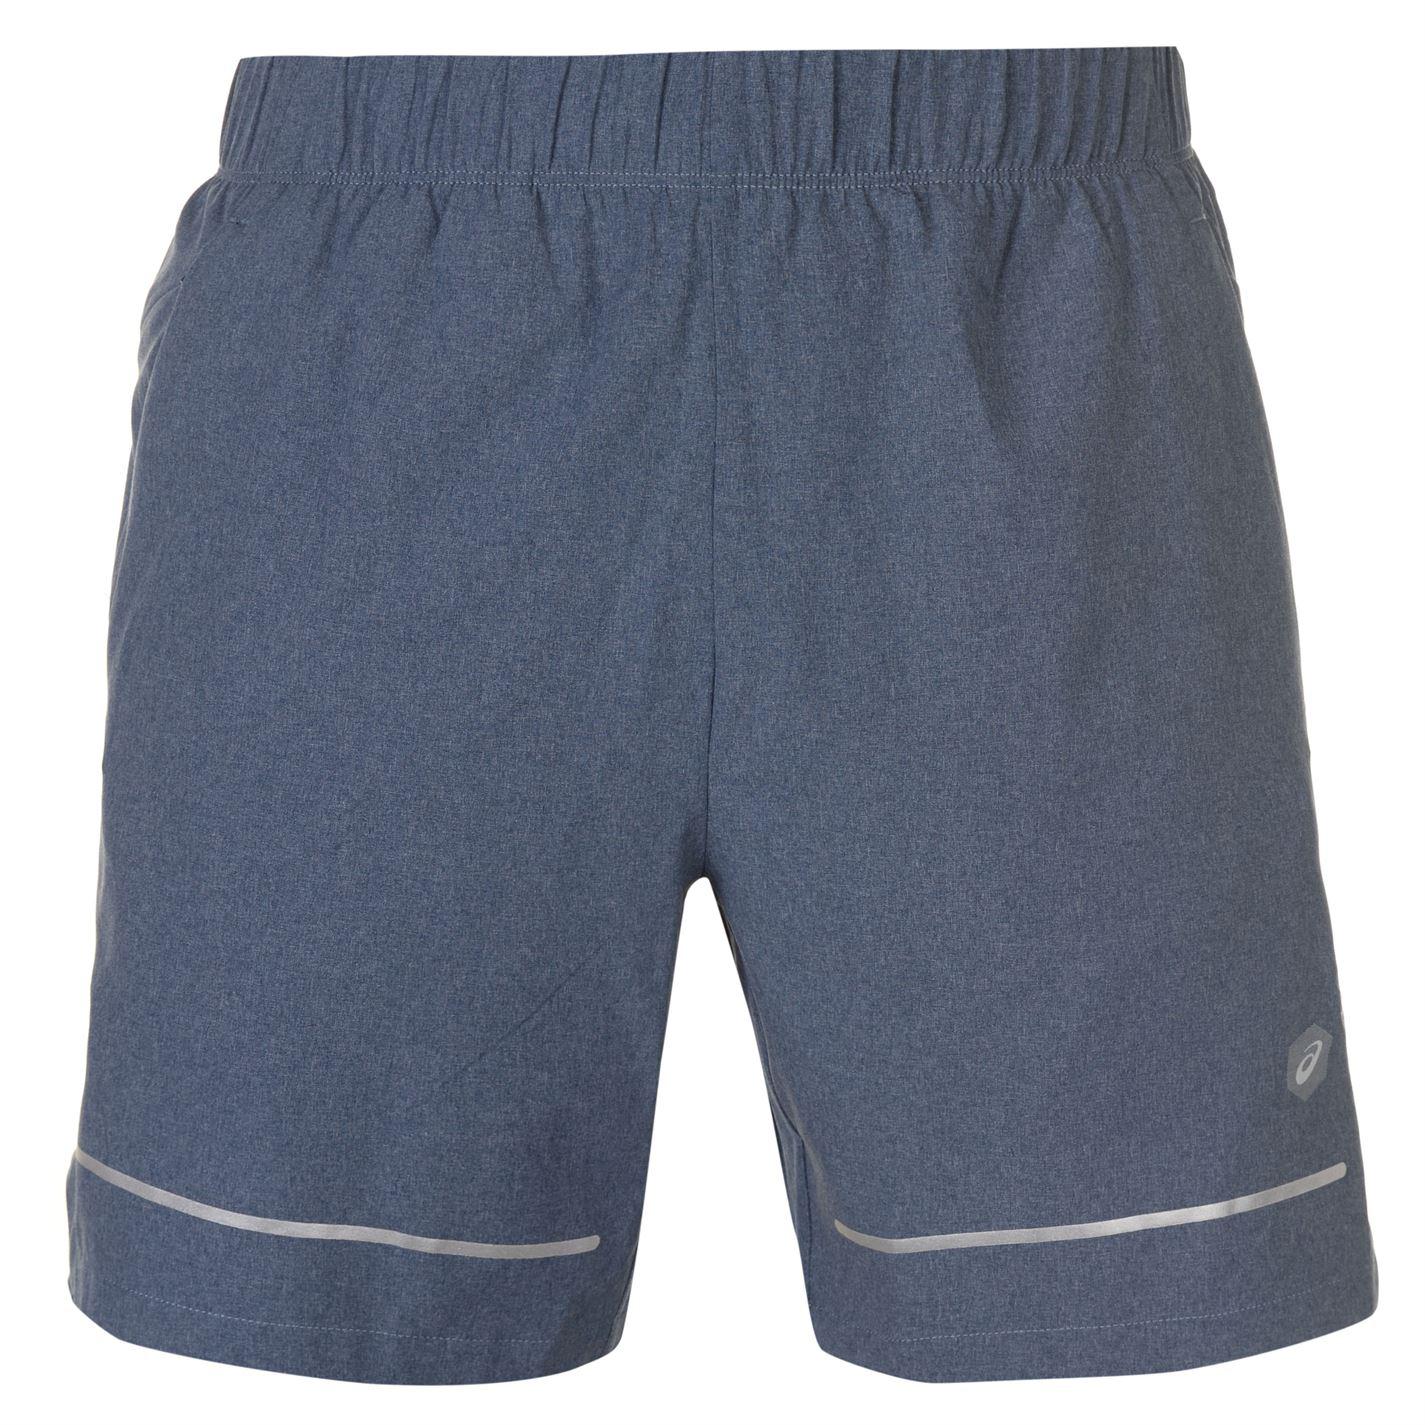 Asics LS 7inch Shorts Mens